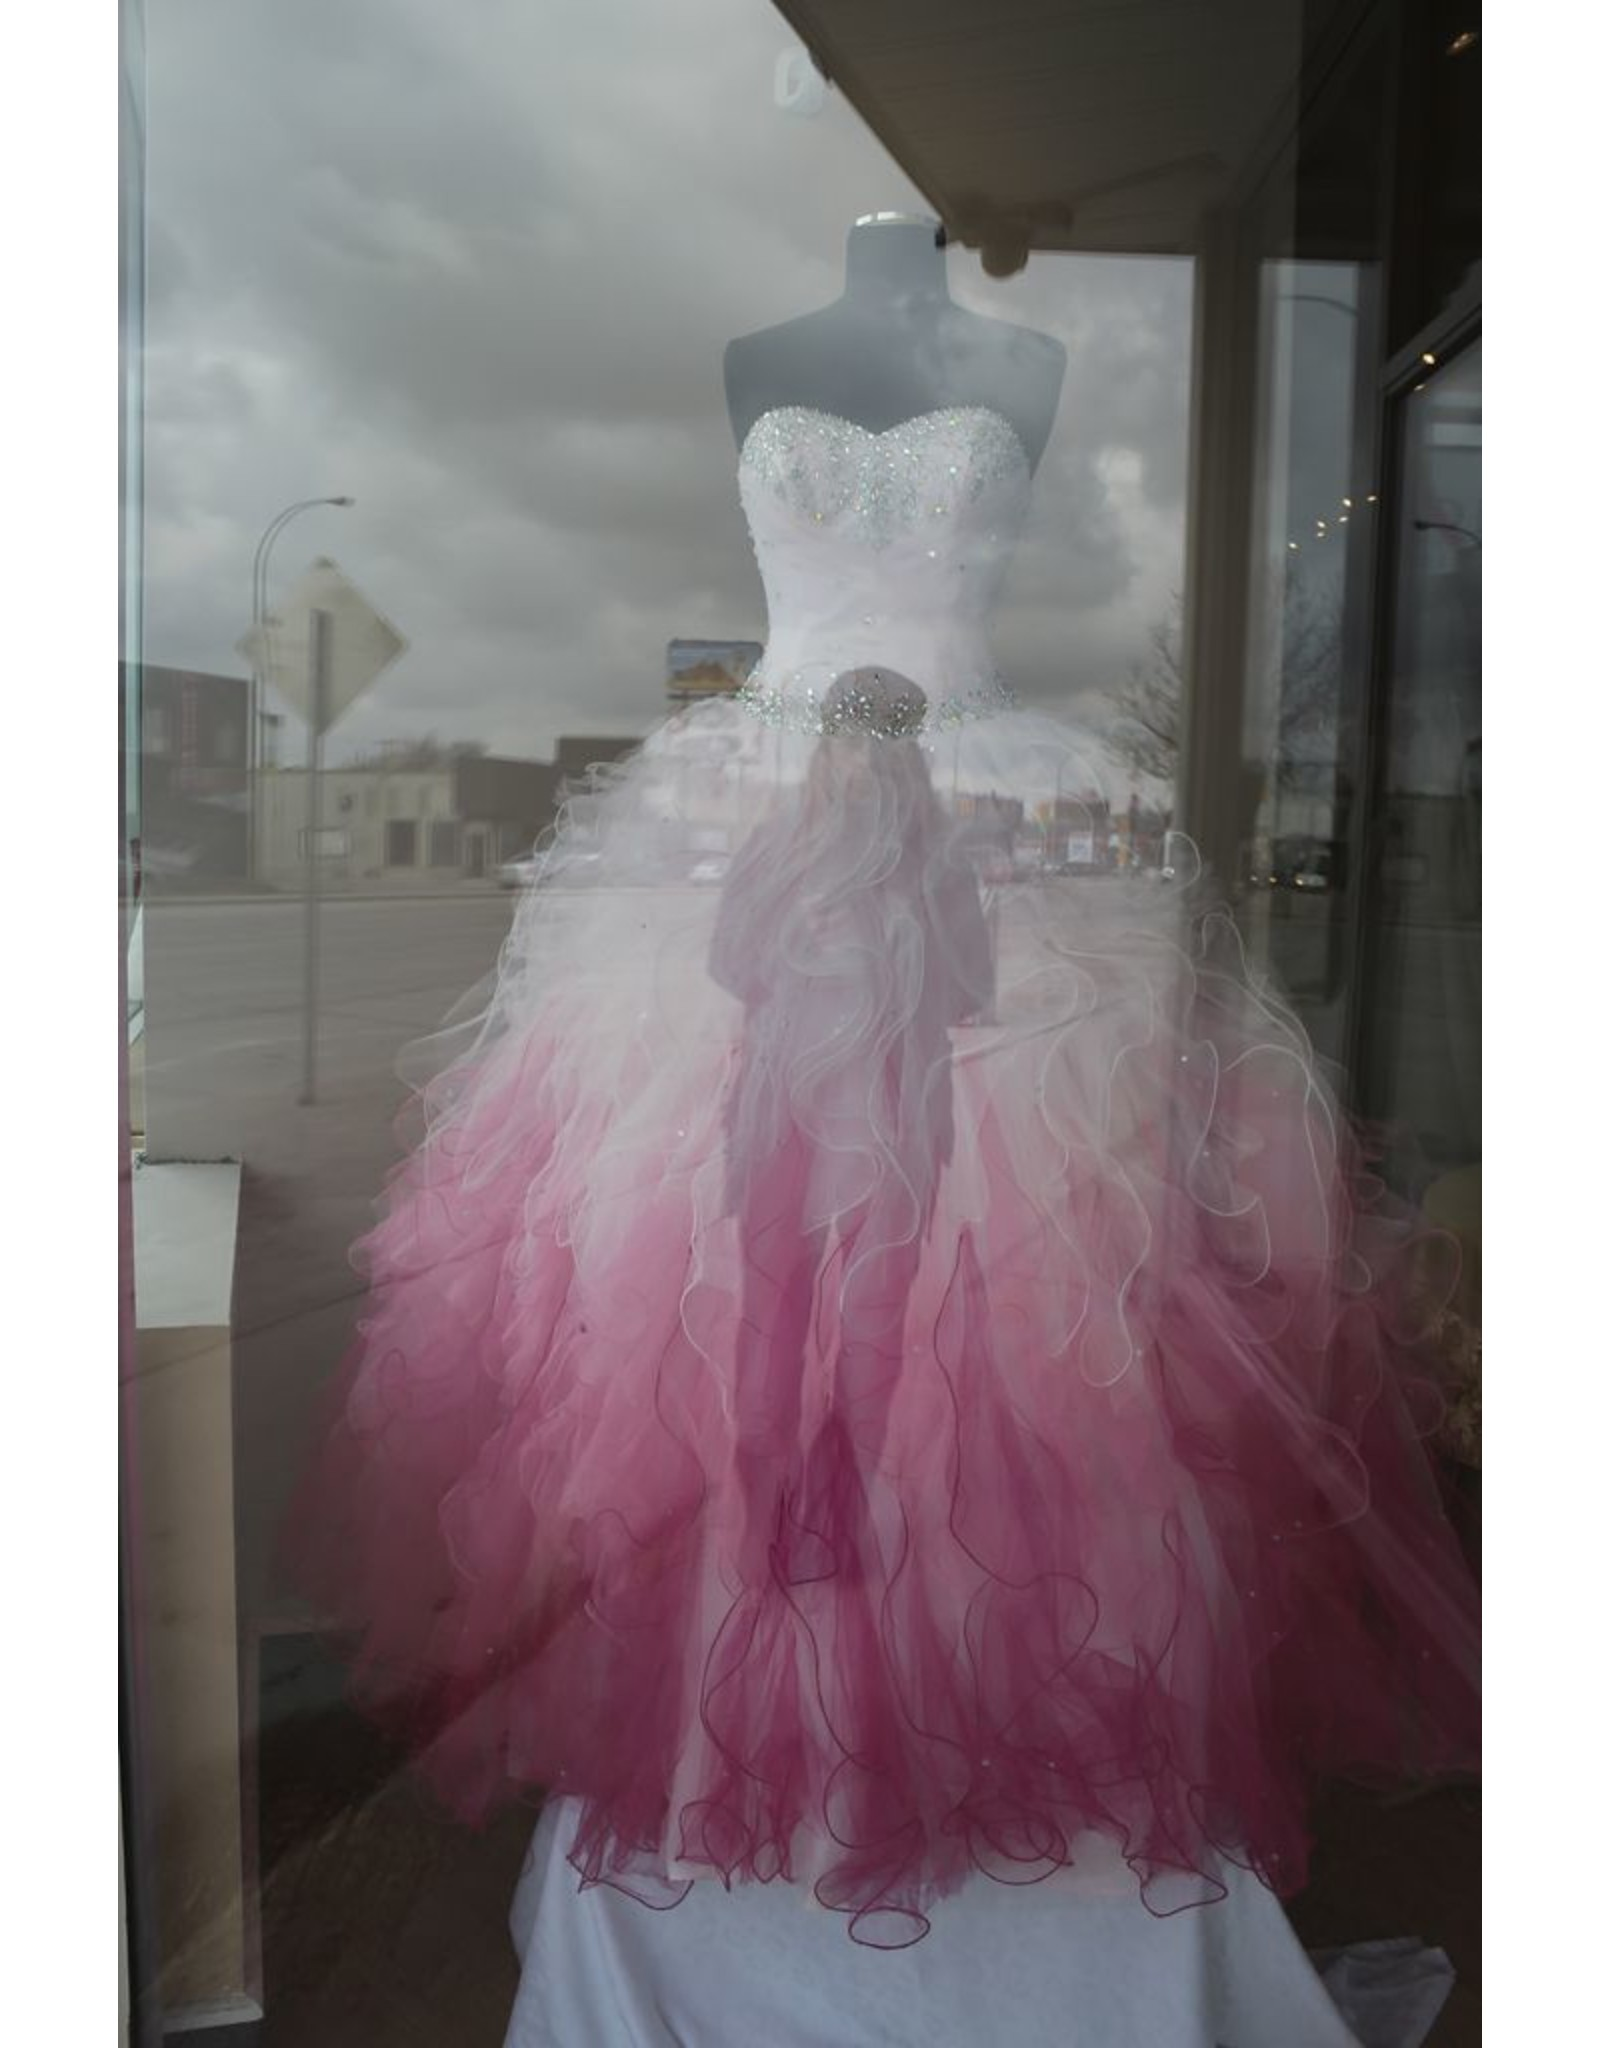 LeBlanc, Marie Red Dress